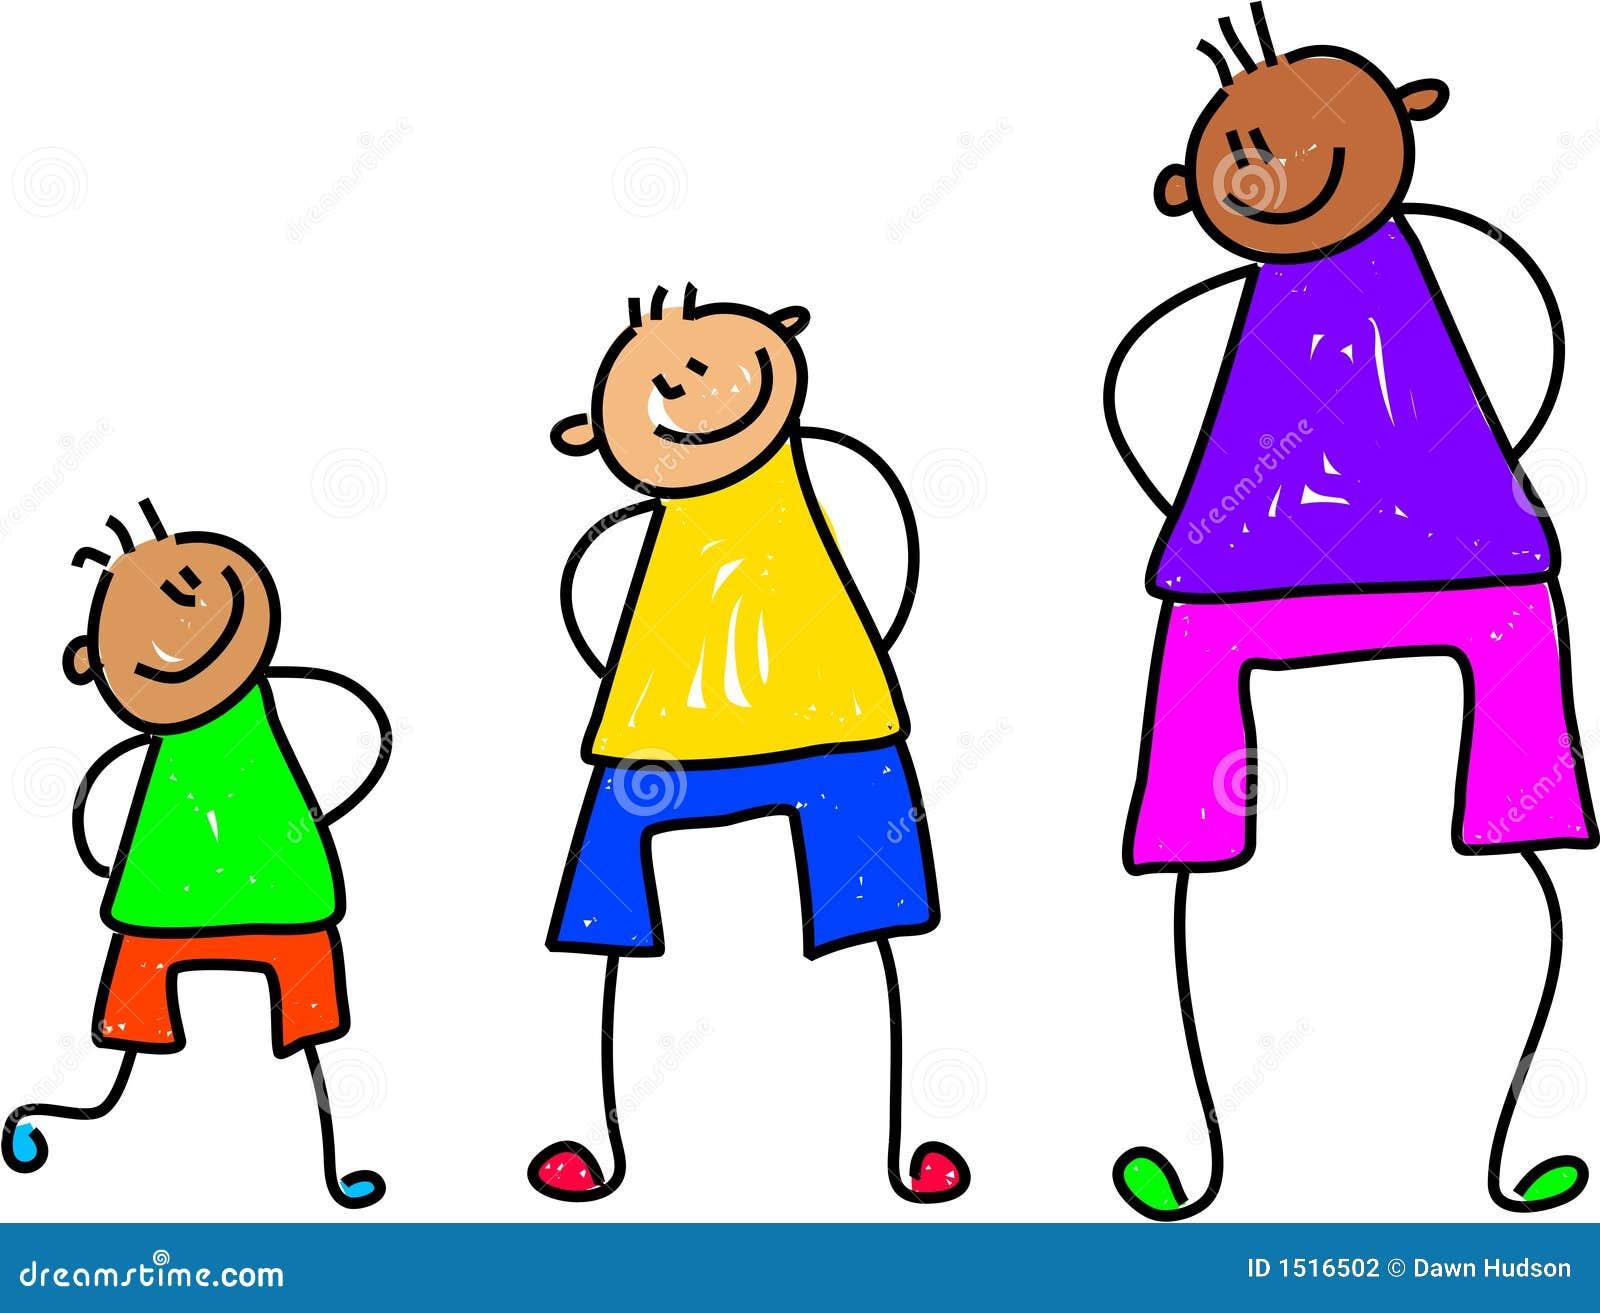 Growing Boys Stock Photography - Image: 1516502